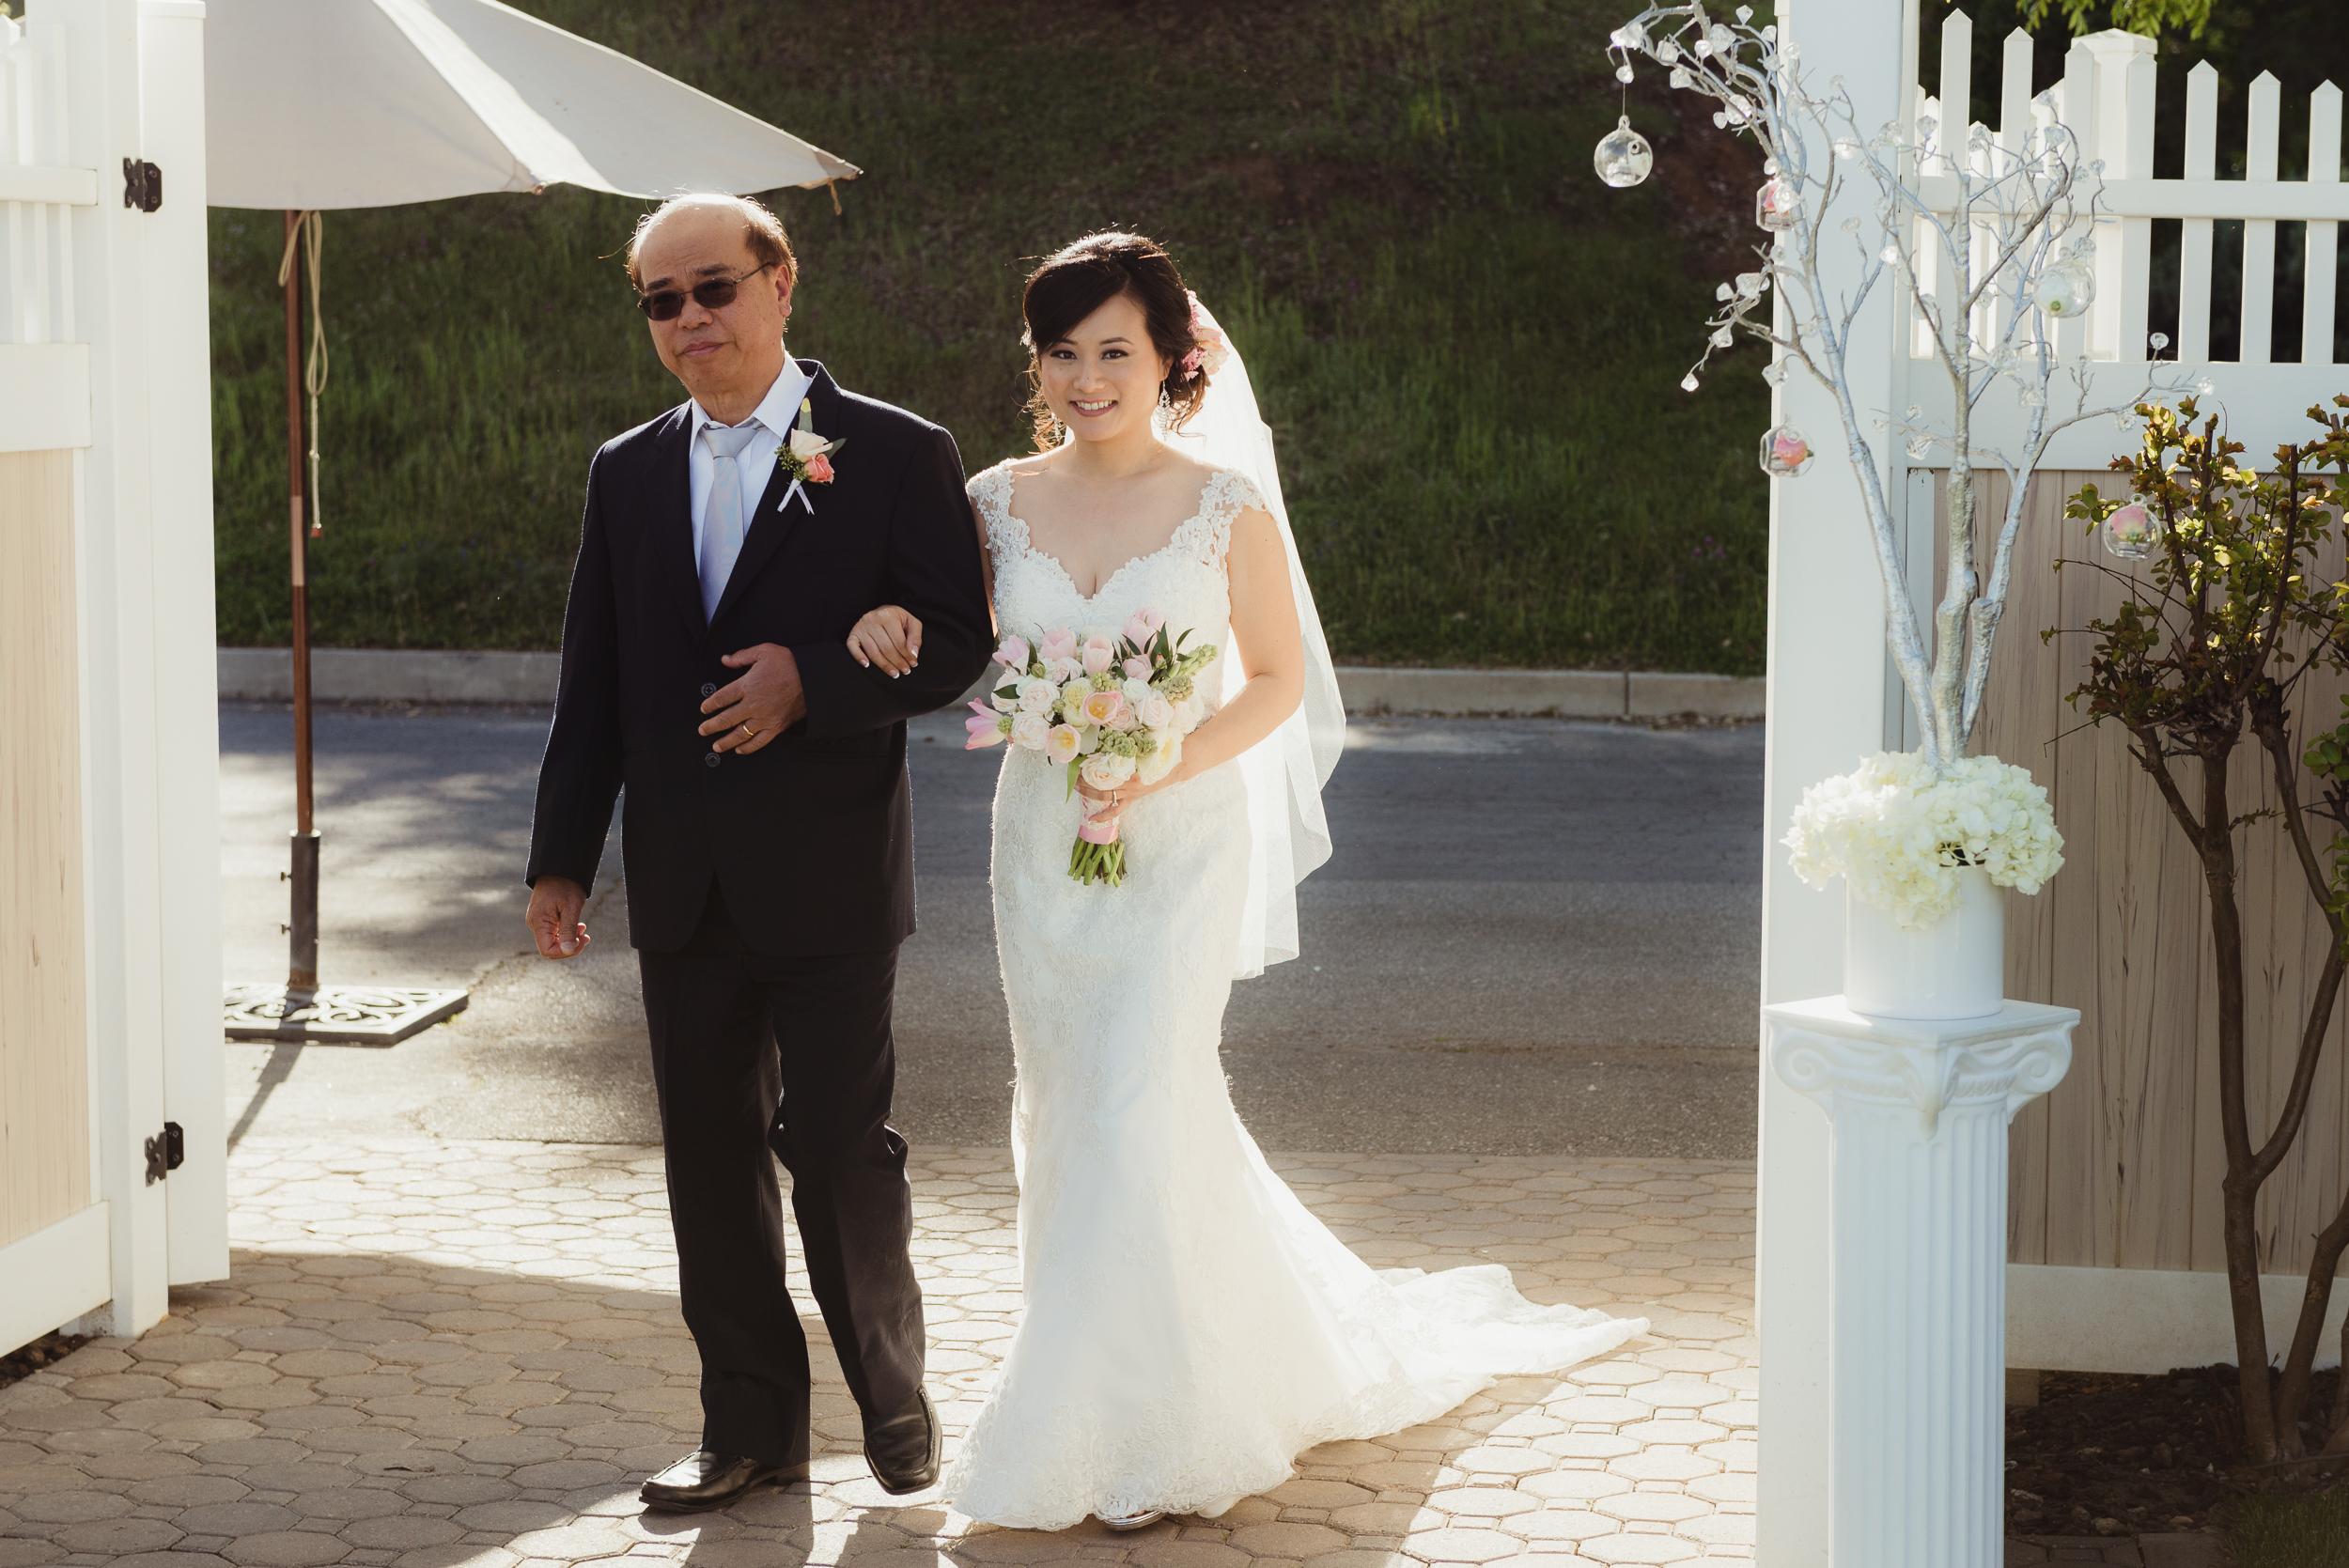 16-saratoga-country-club-wedding-vivianchen-203.jpg